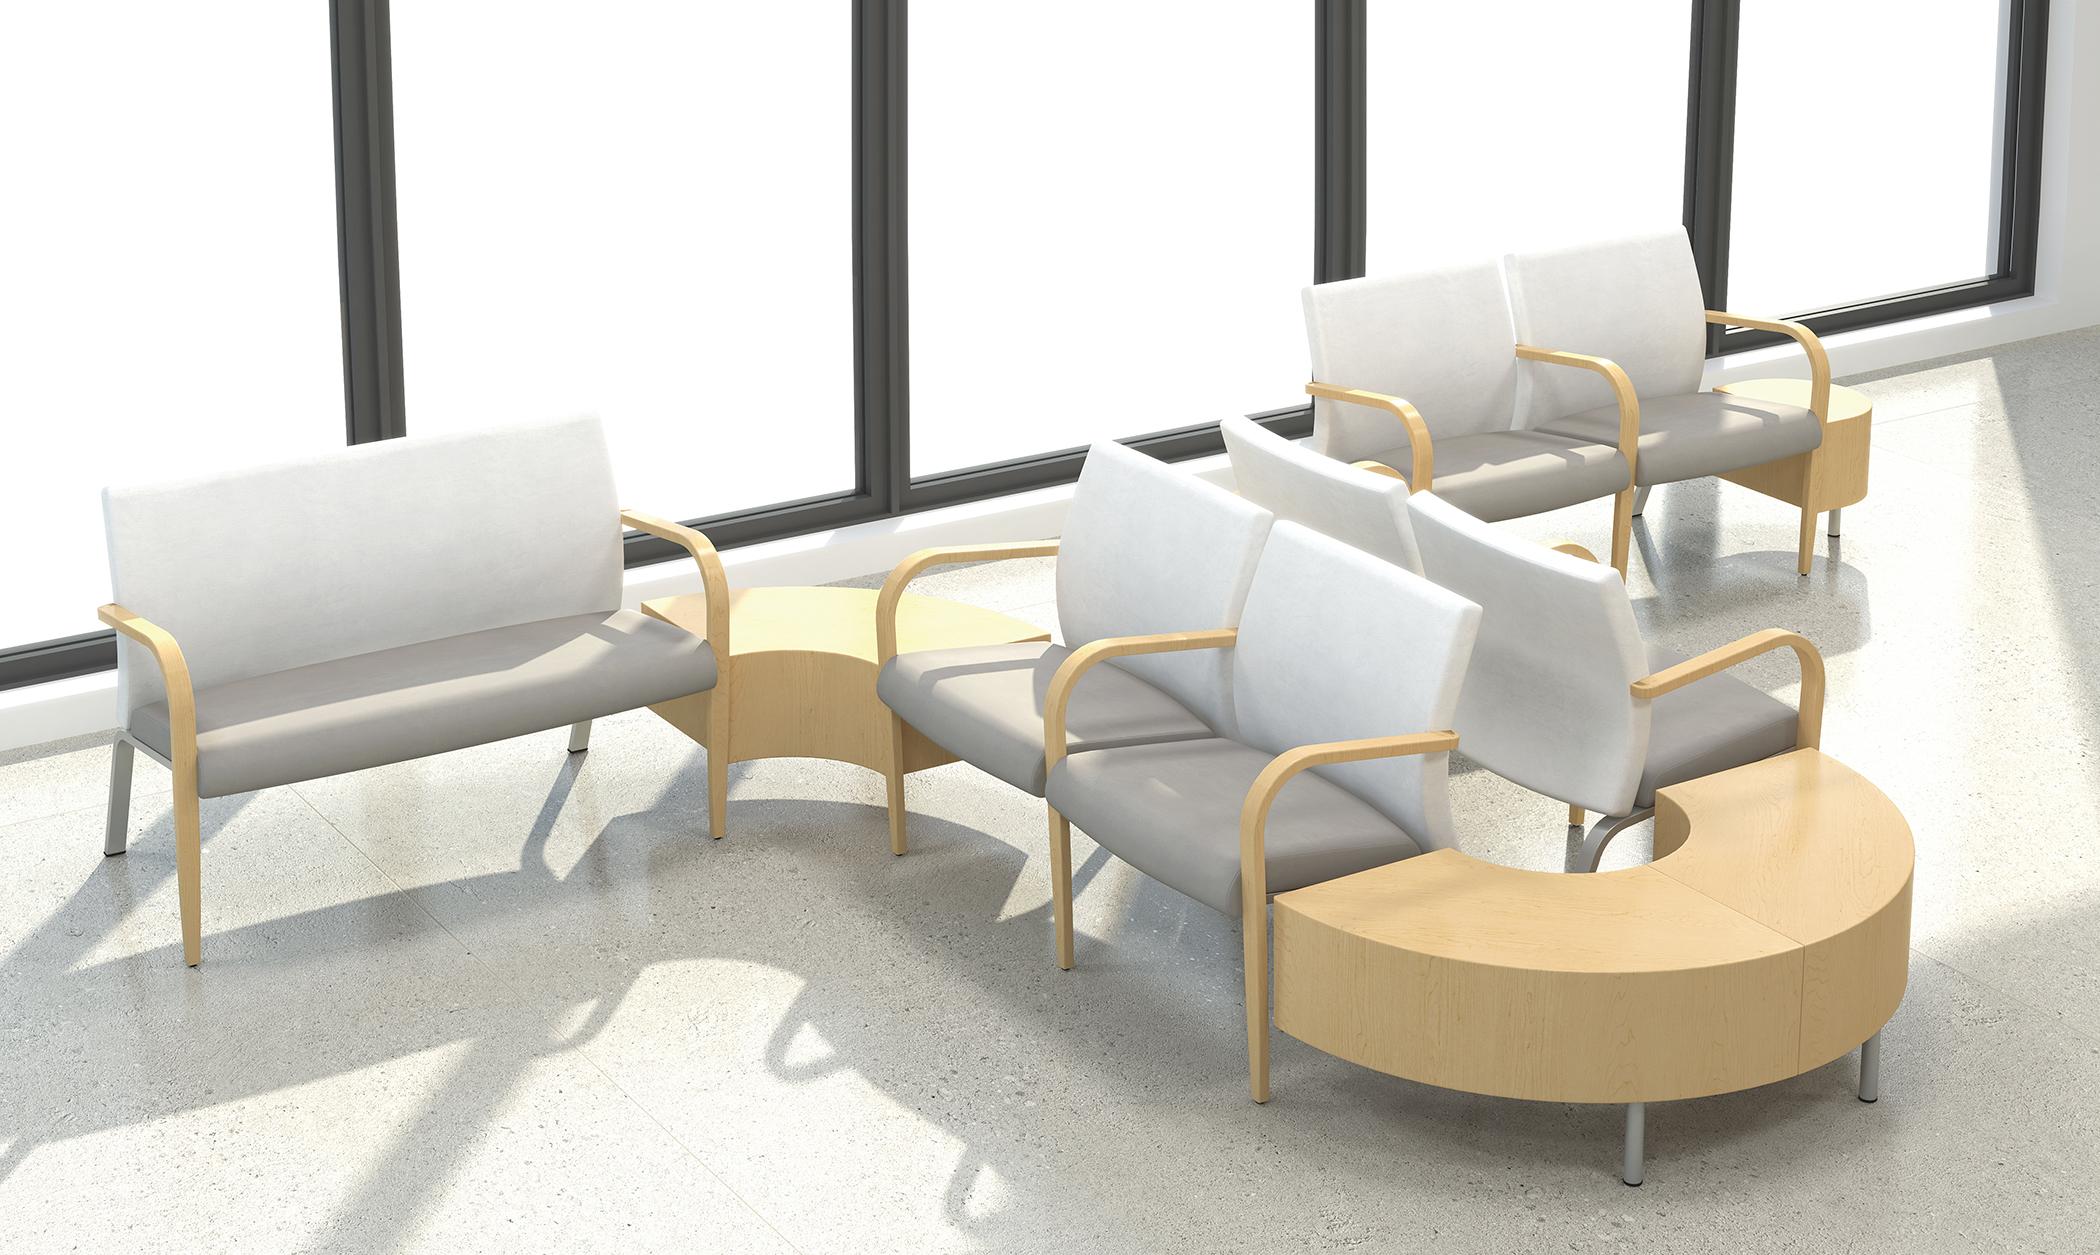 Stylish Krug / Cressida waiting room furniture